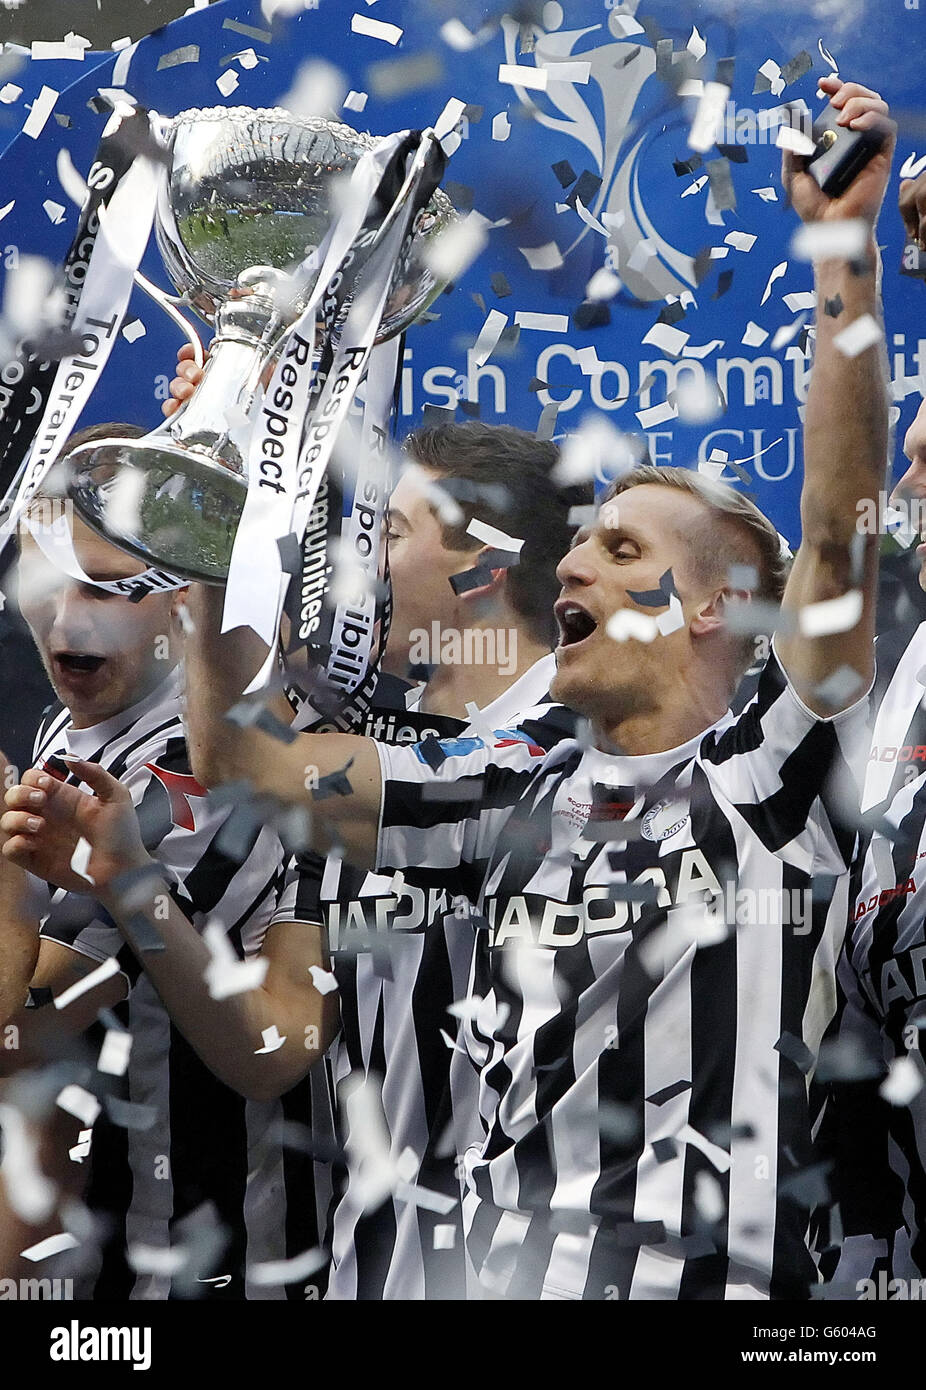 Soccer - Scottish Communities League Cup - Final - St Mirren v Heart of Midlothian - Hampden Park - Stock Image